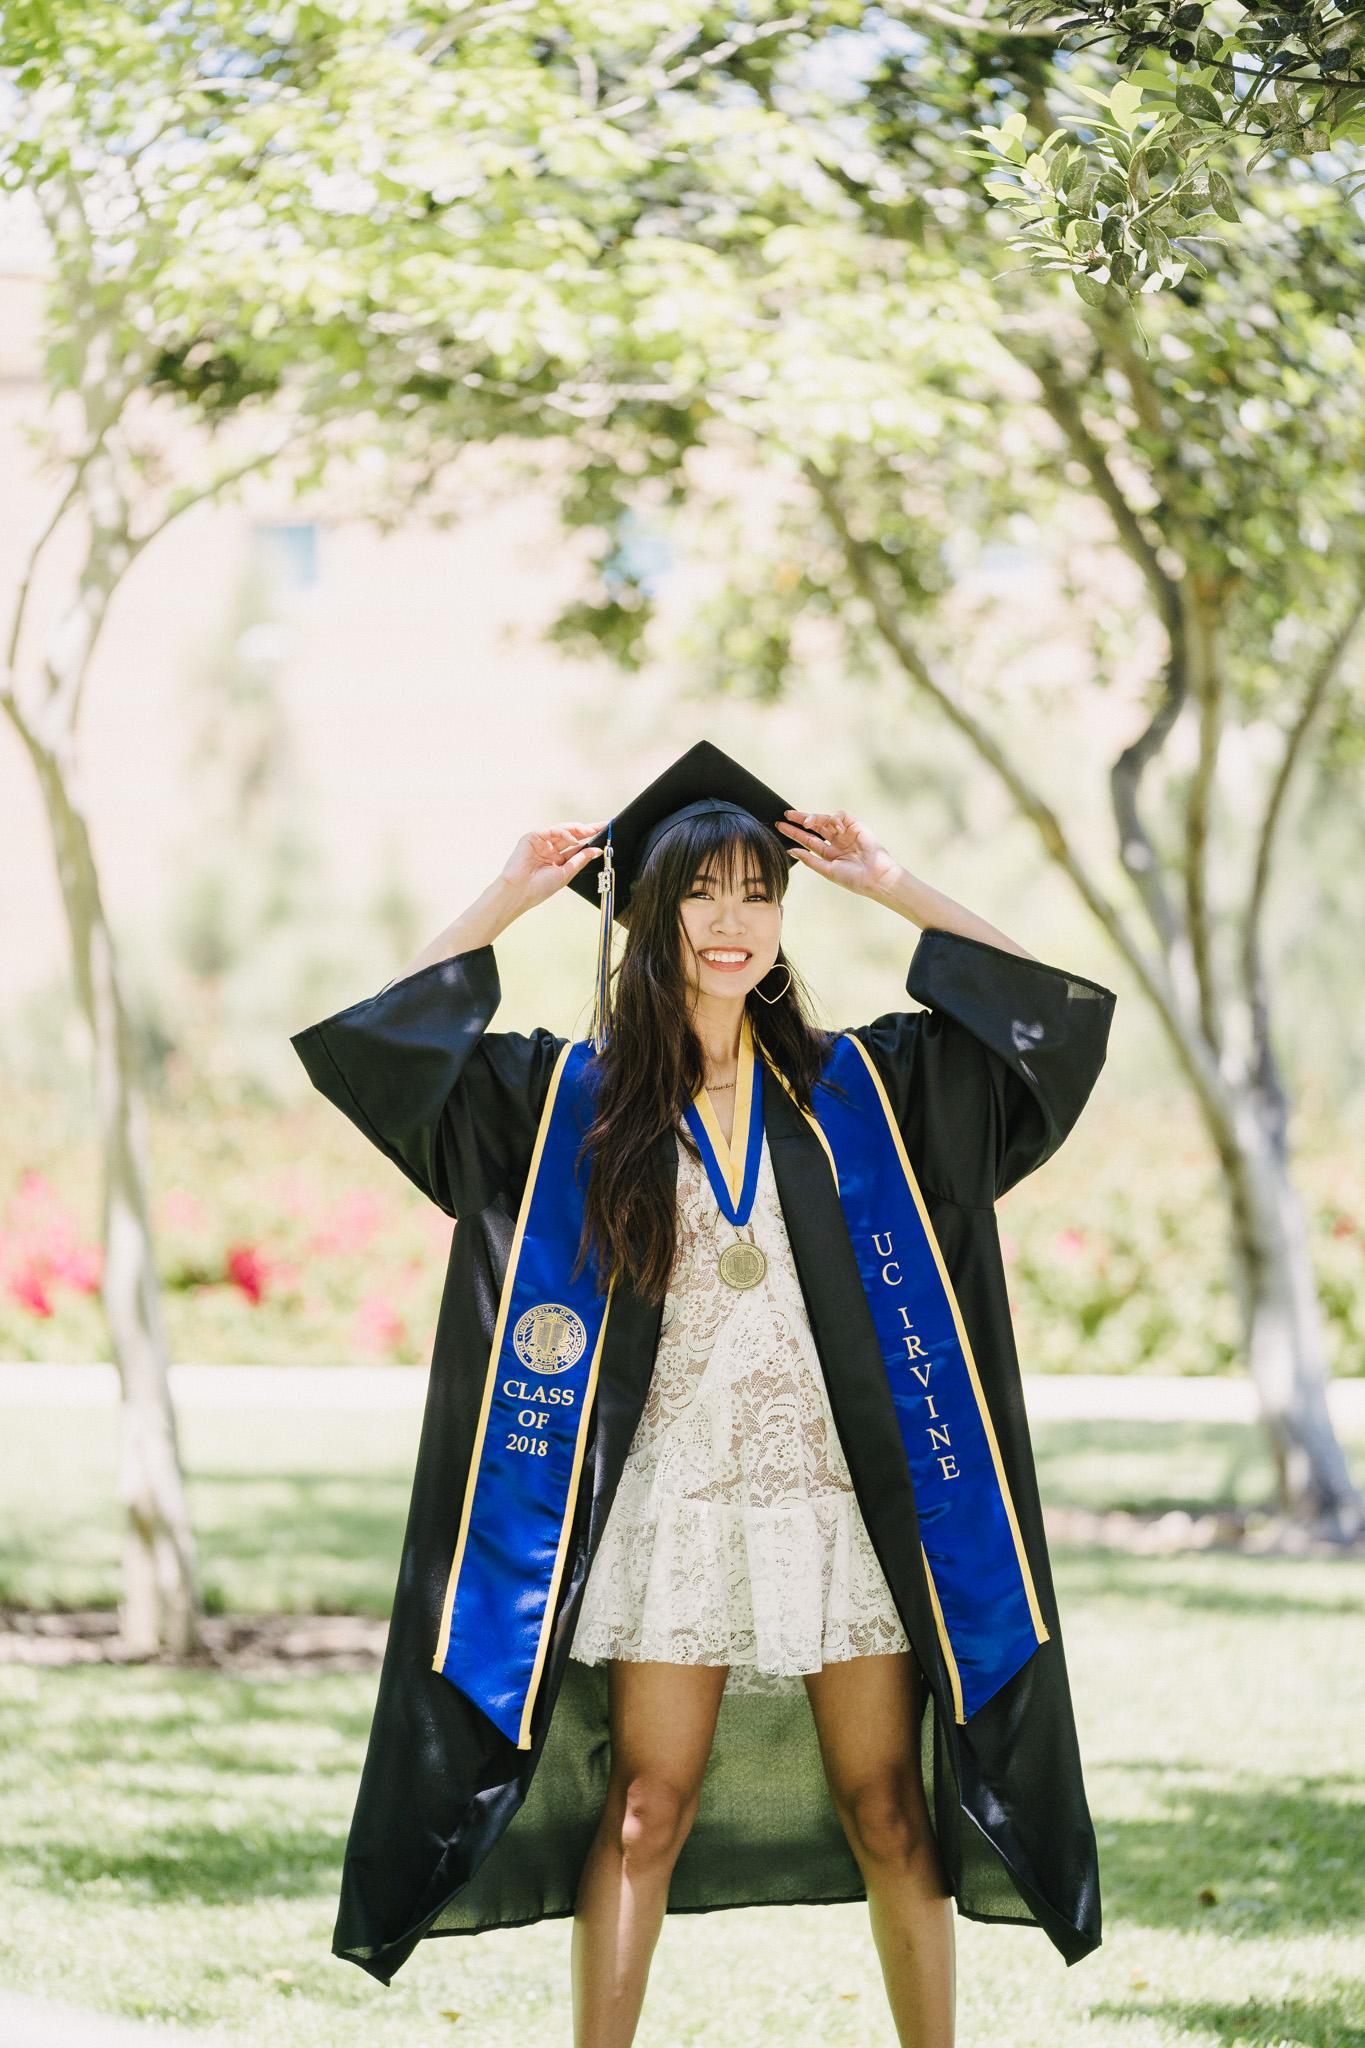 [5-16-2018] Vi's Graduation Photoshoot156.jpg